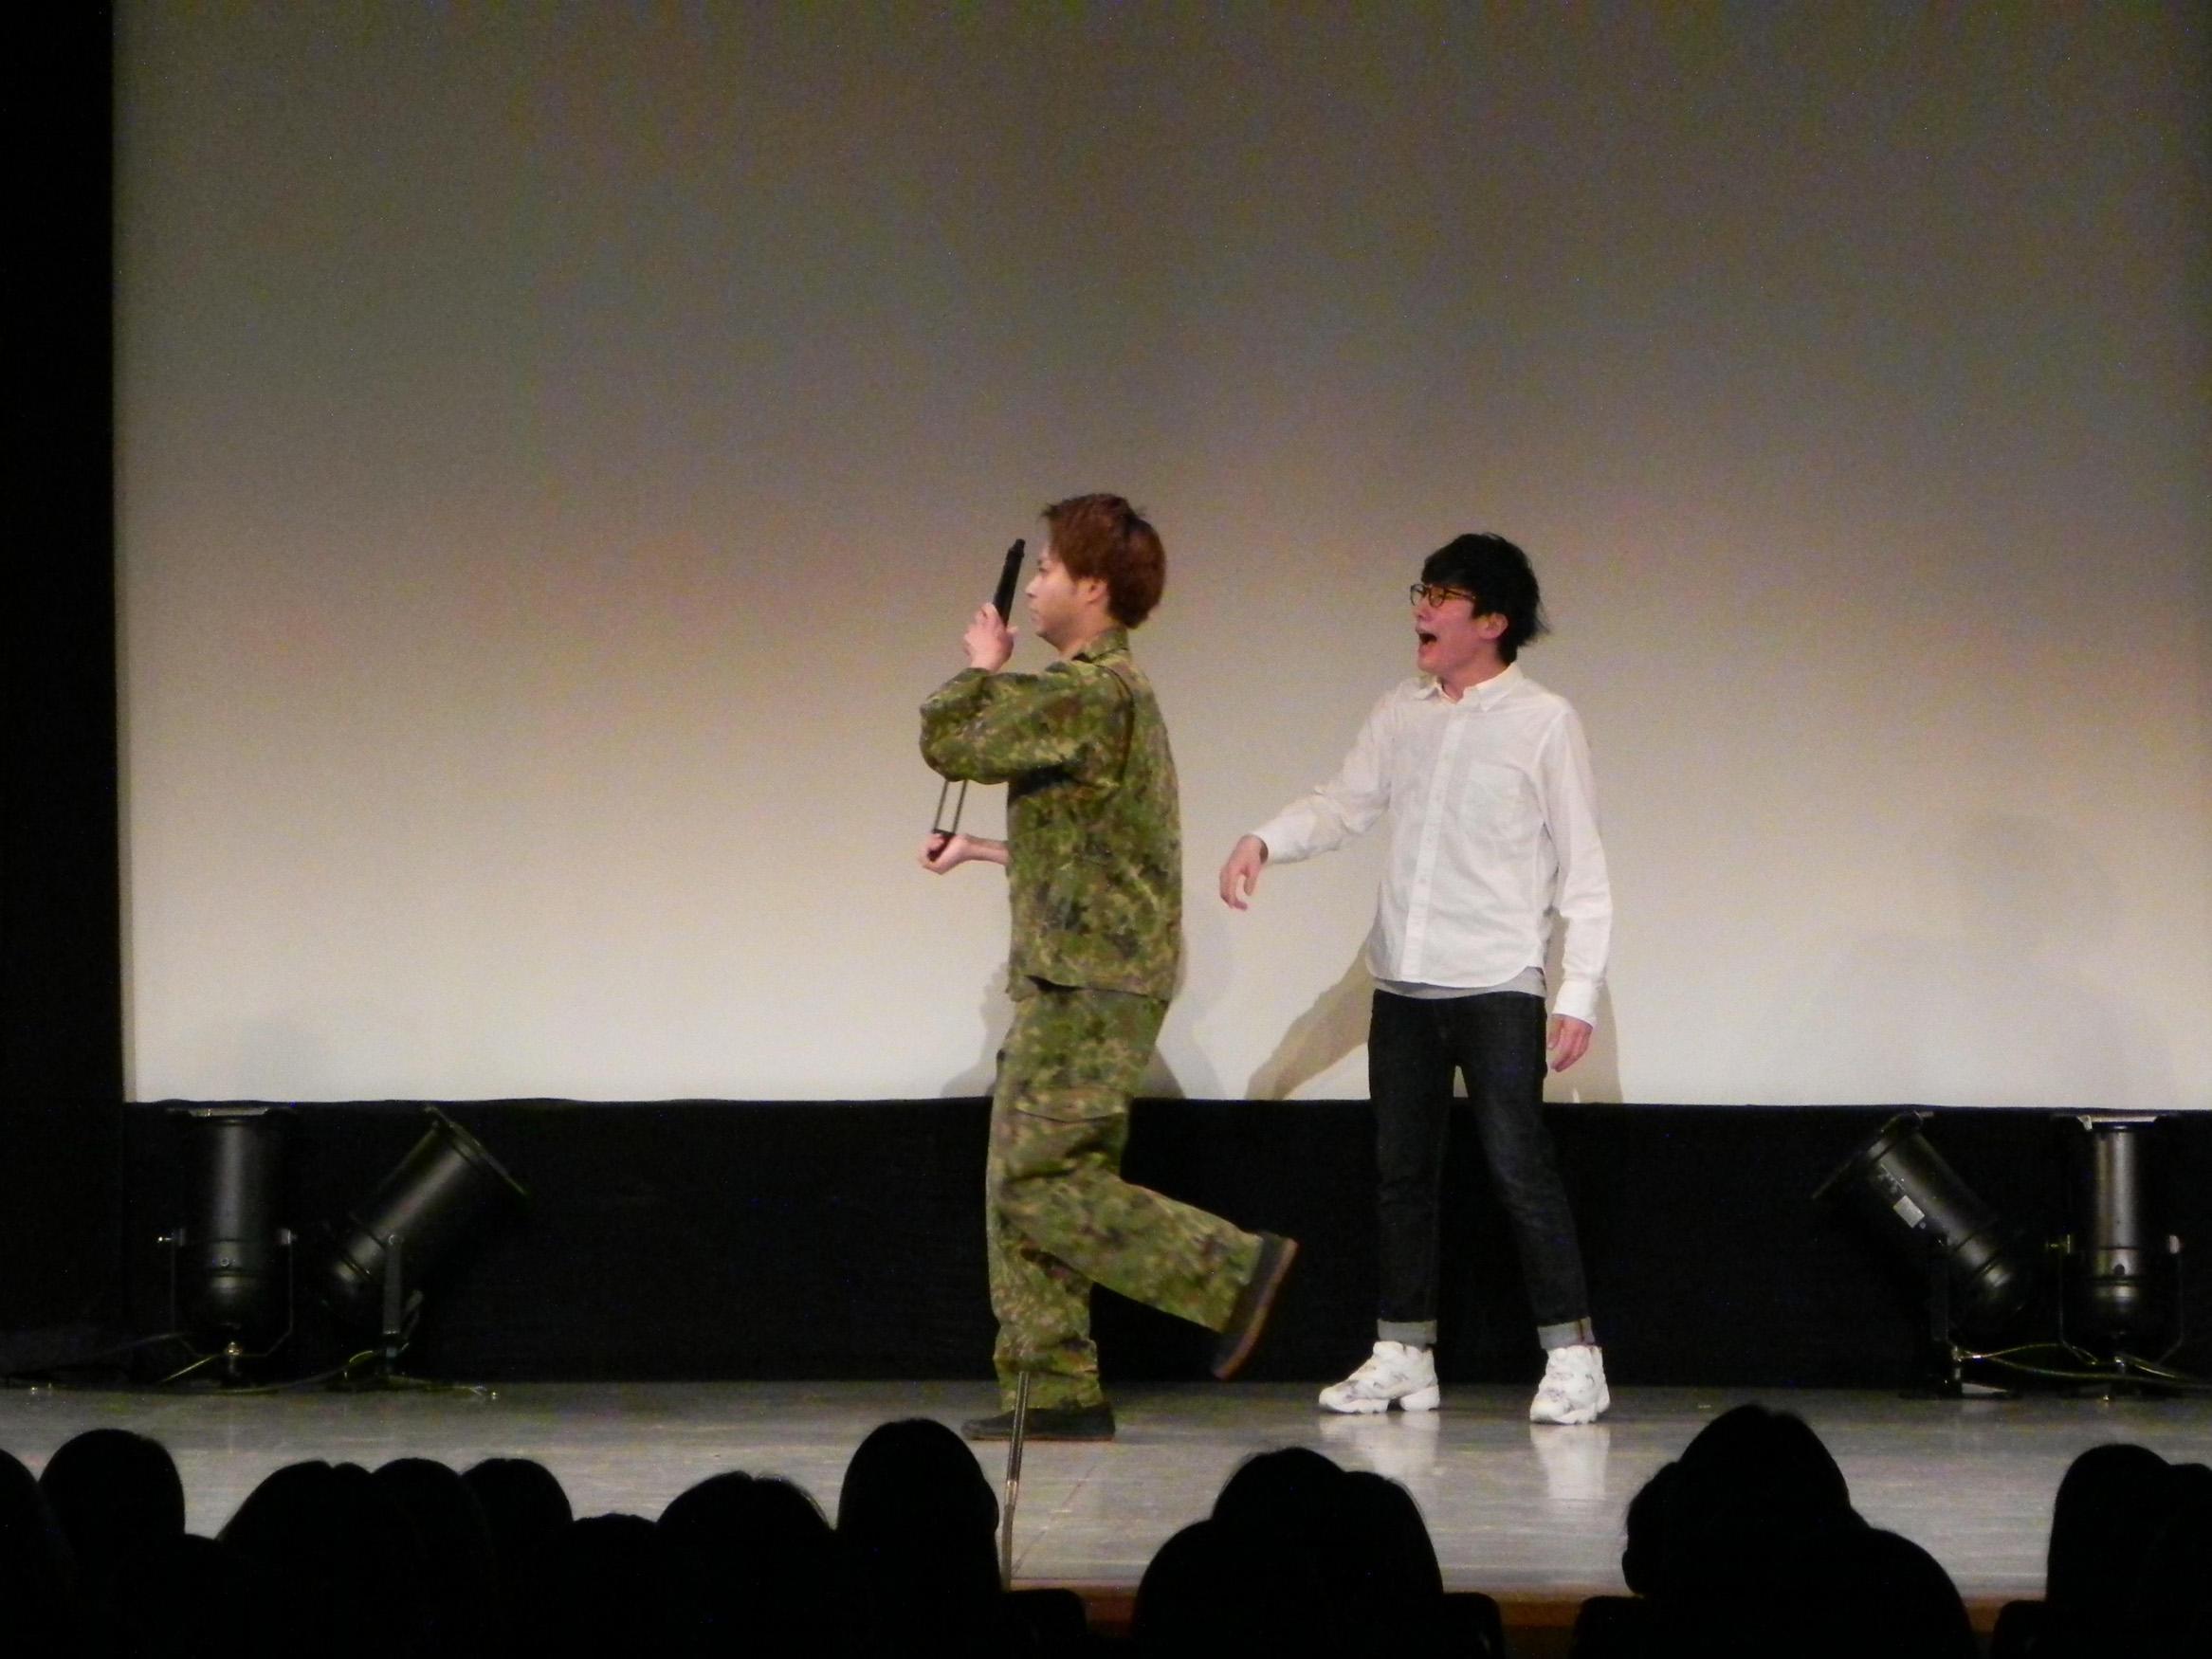 http://news.yoshimoto.co.jp/20170425152333-76e9454dfa043df968a9987729dd0161f5c33e65.jpg